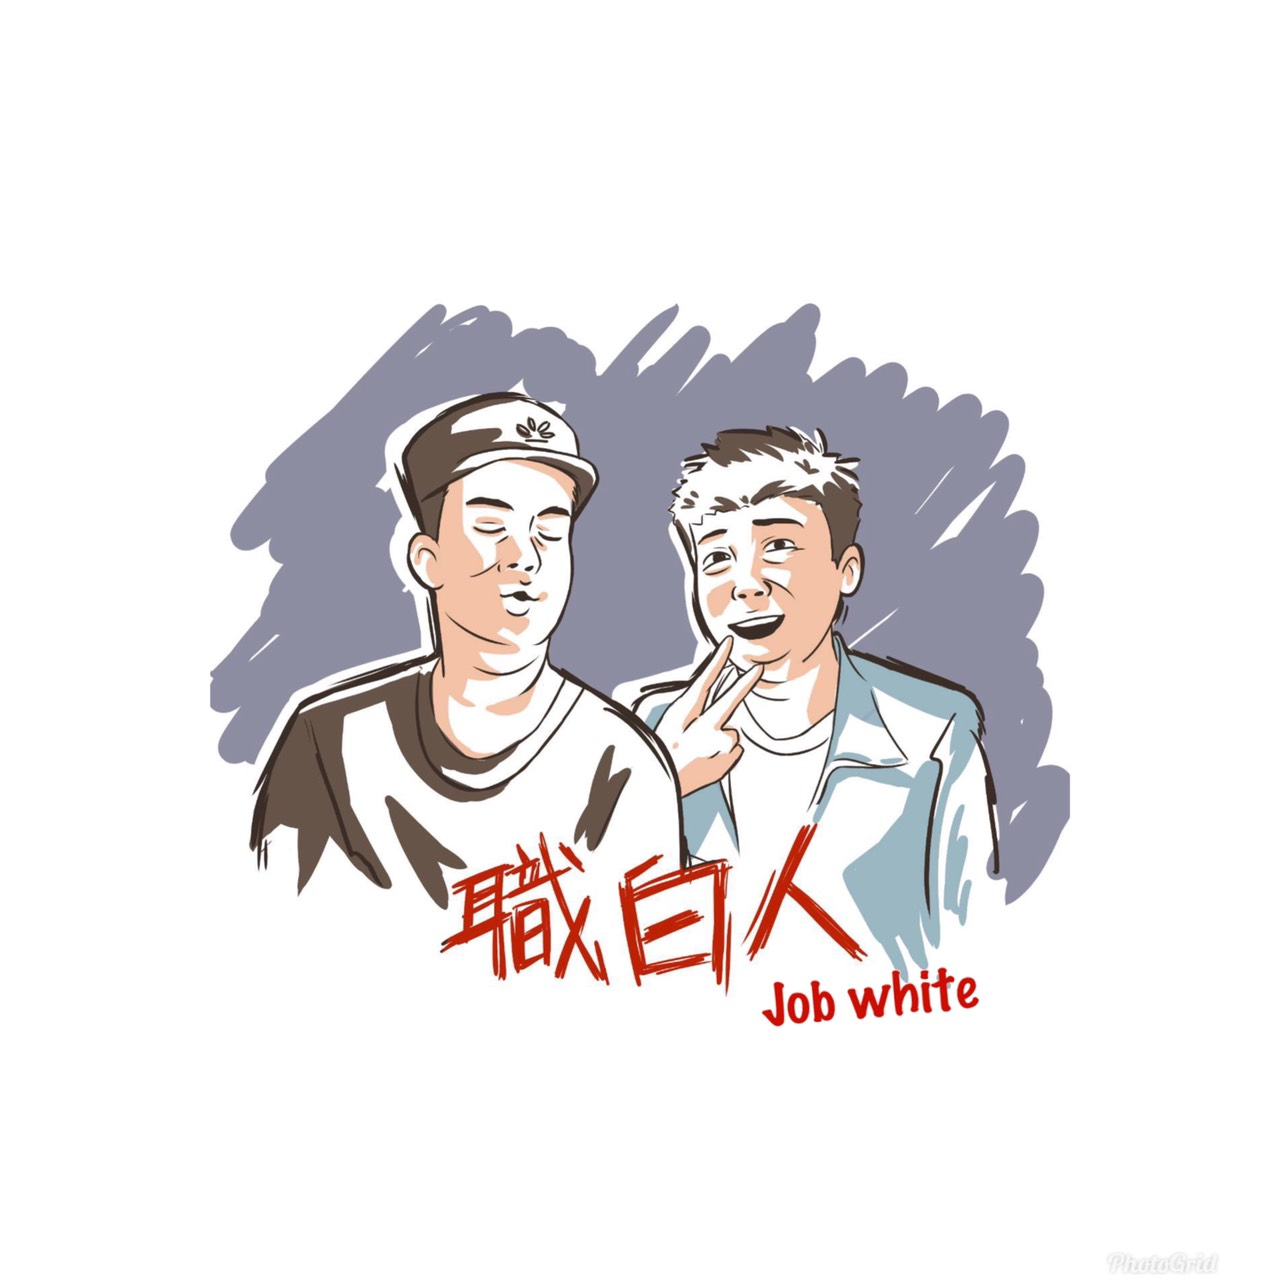 EP13 終於放假啦!過年特別企劃 【Job white 職白人】